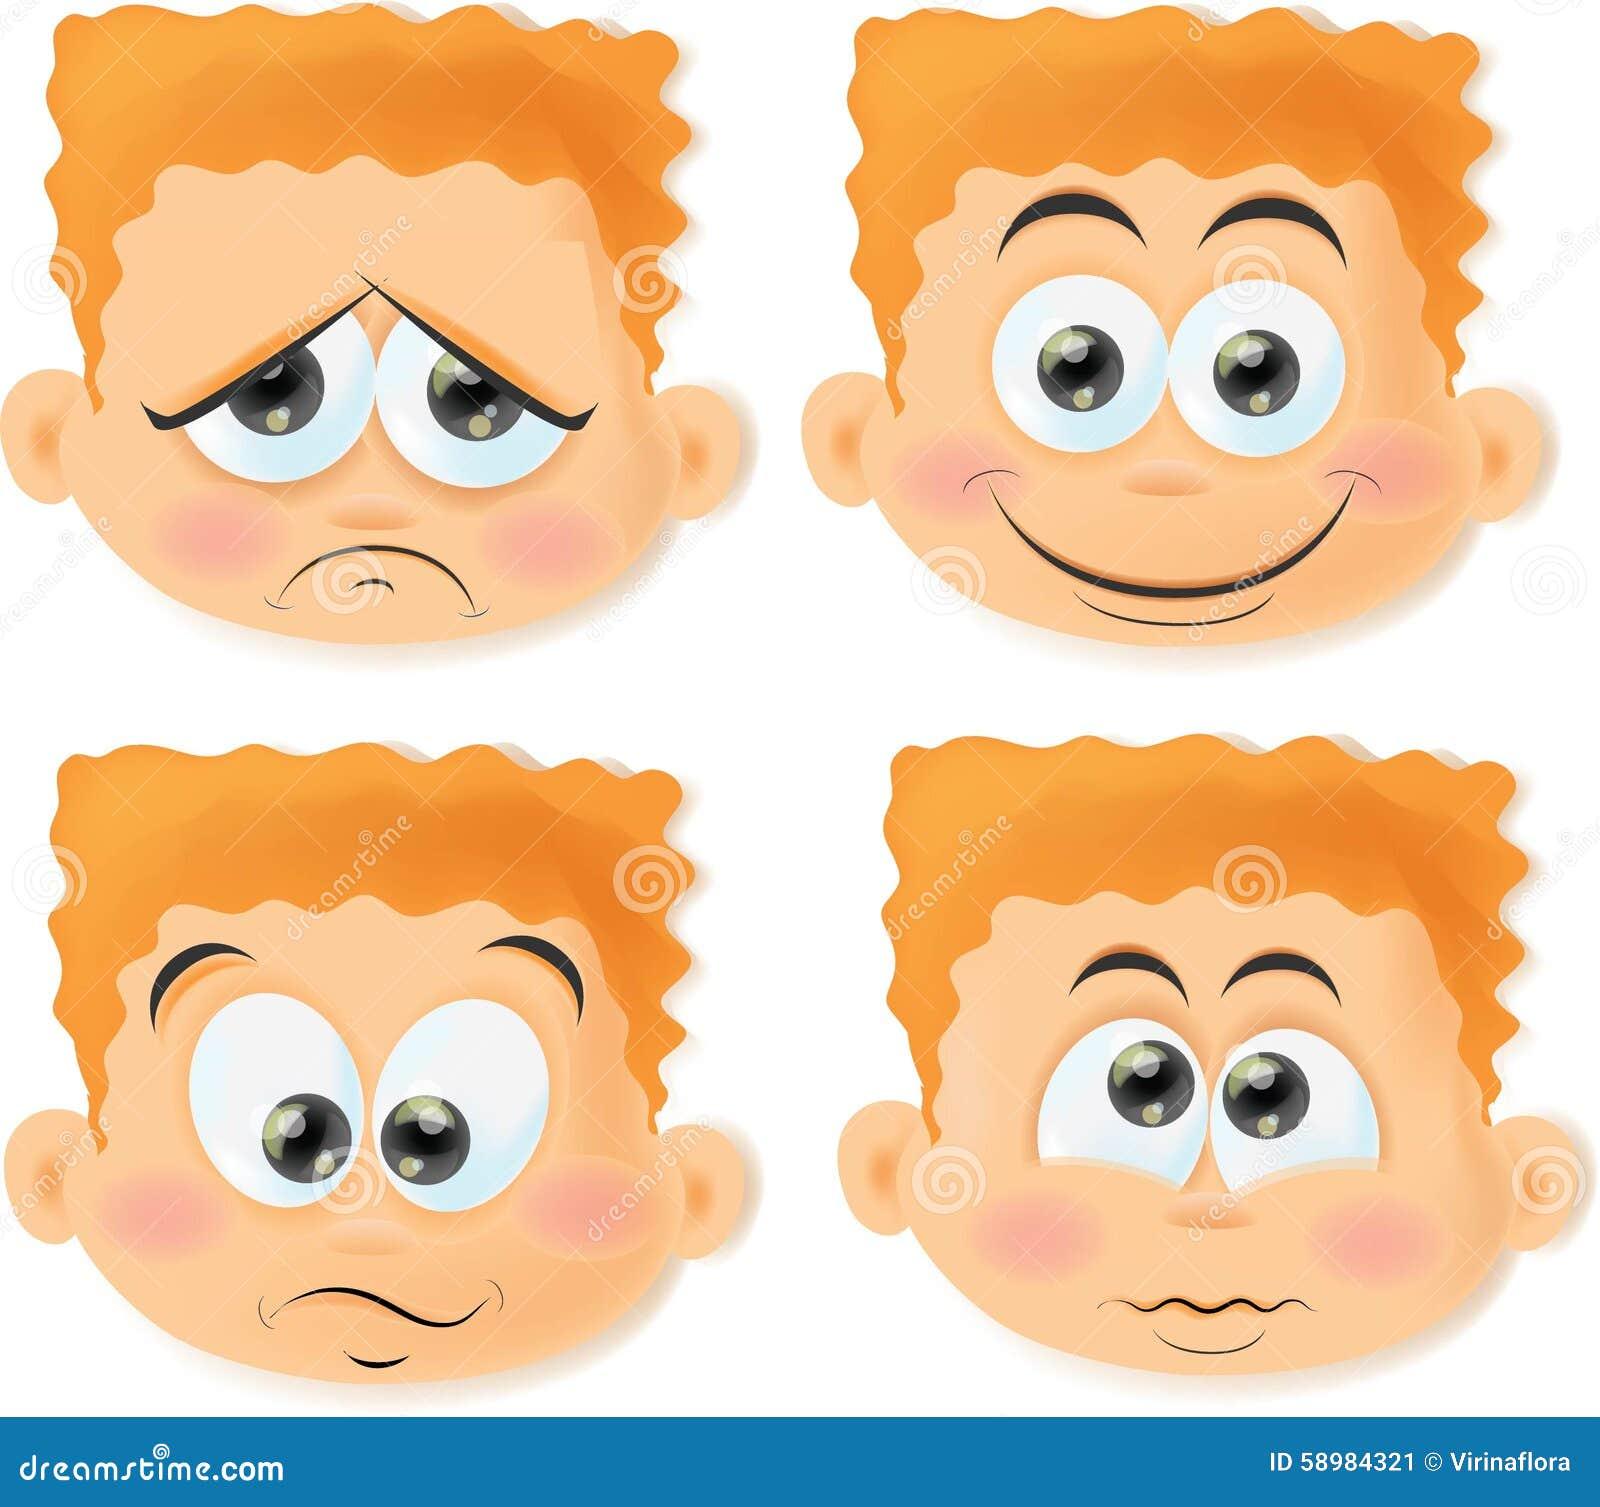 Funny Cartoon Images Of Boys cartoon boys with funny faces,vector stock vector